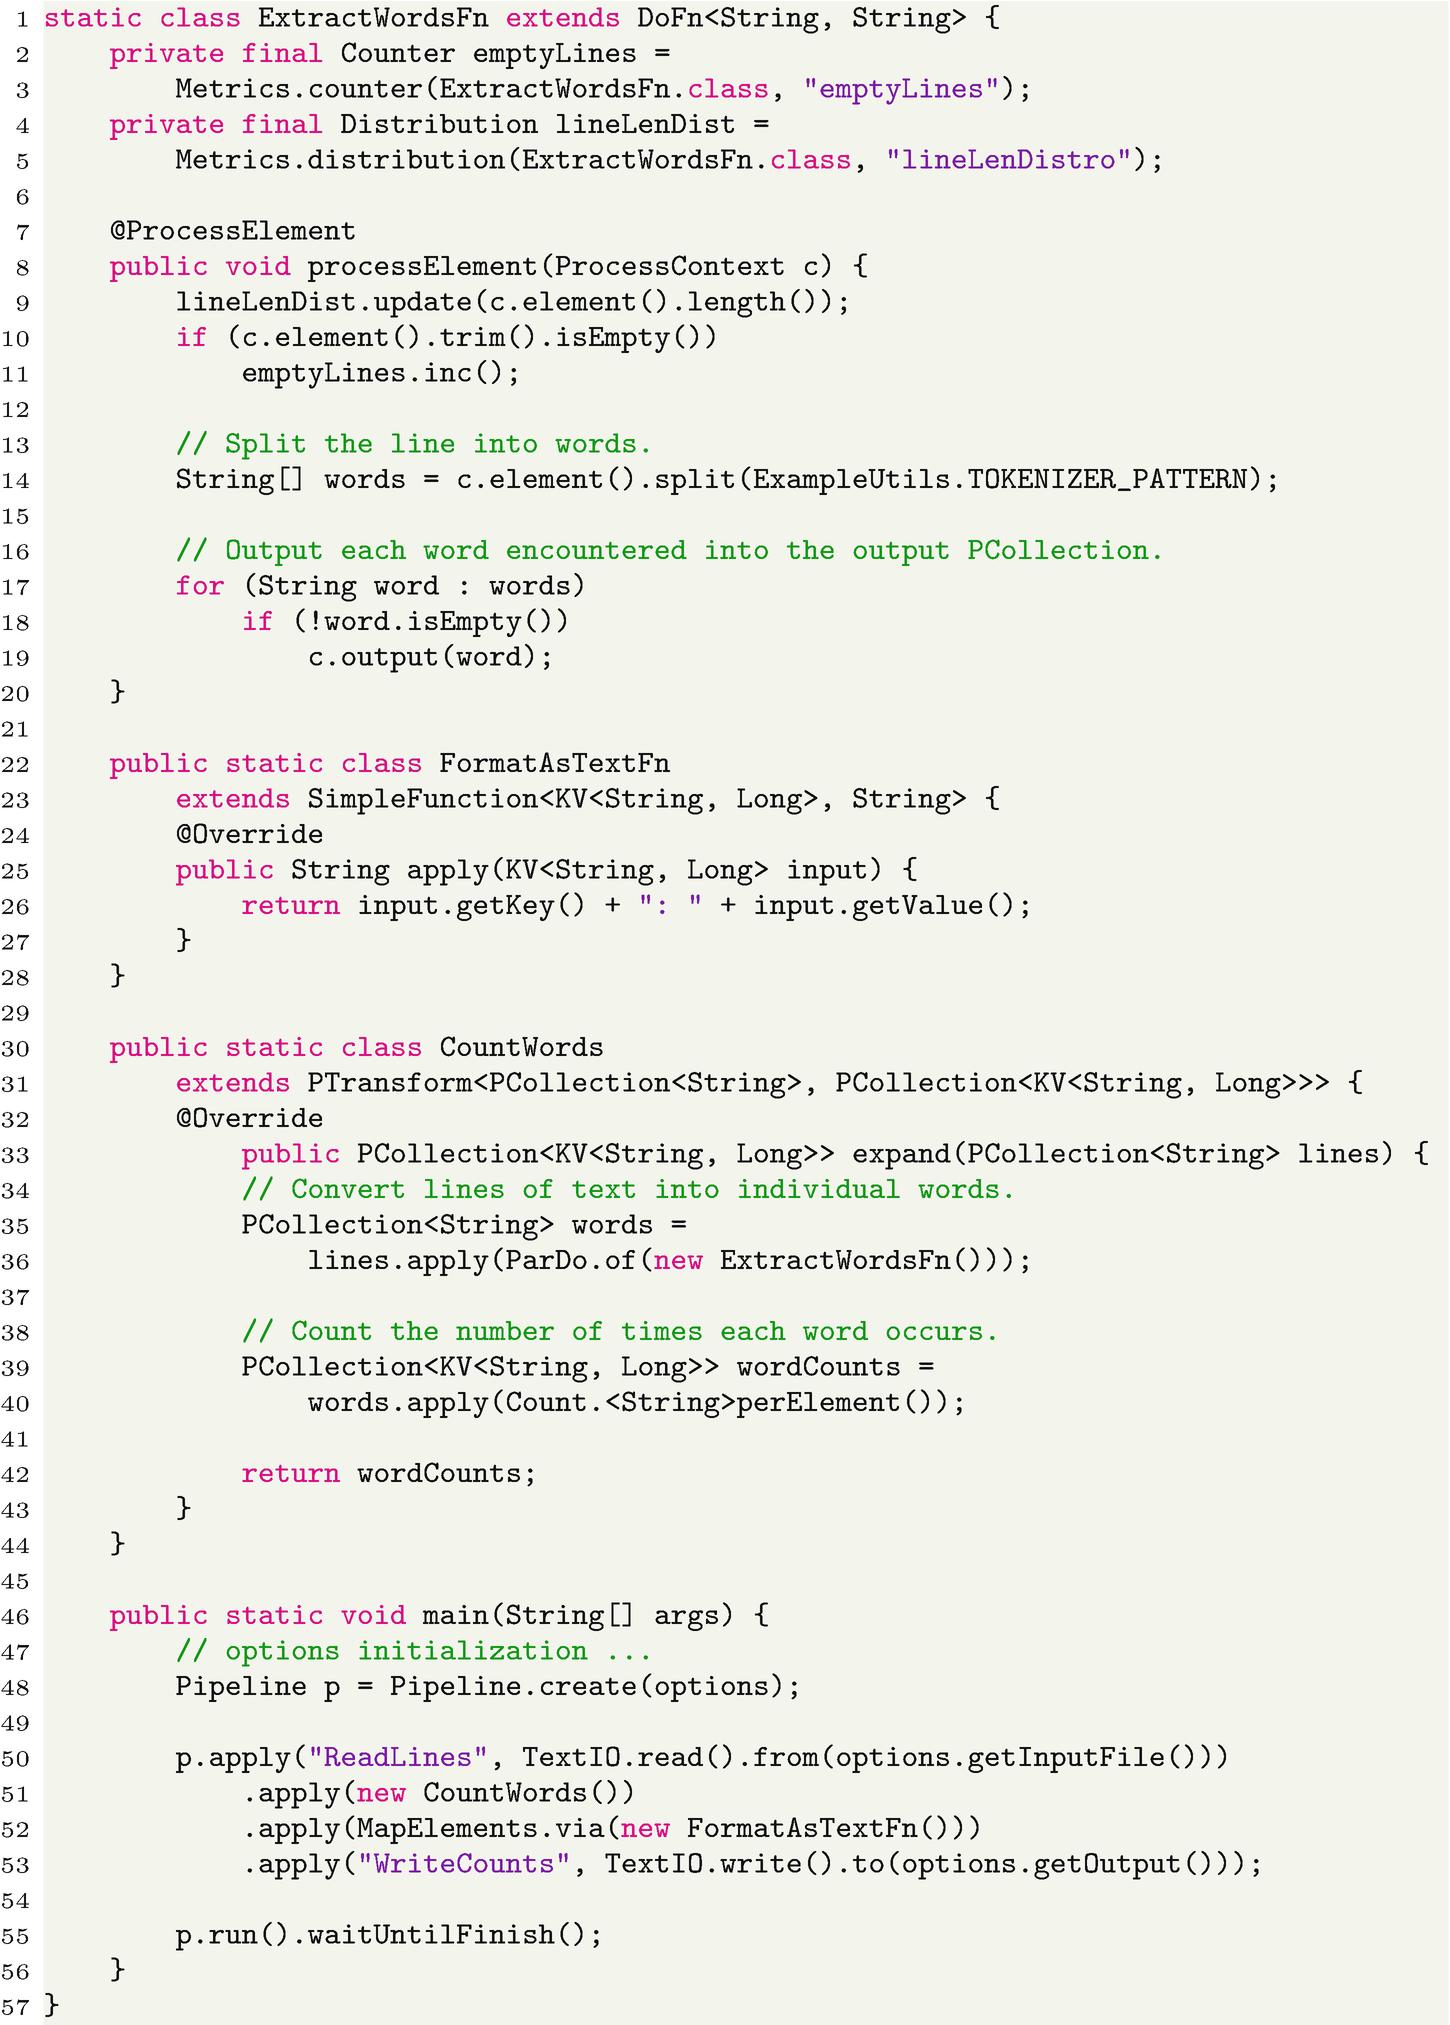 Languages for Big Data analysis   SpringerLink